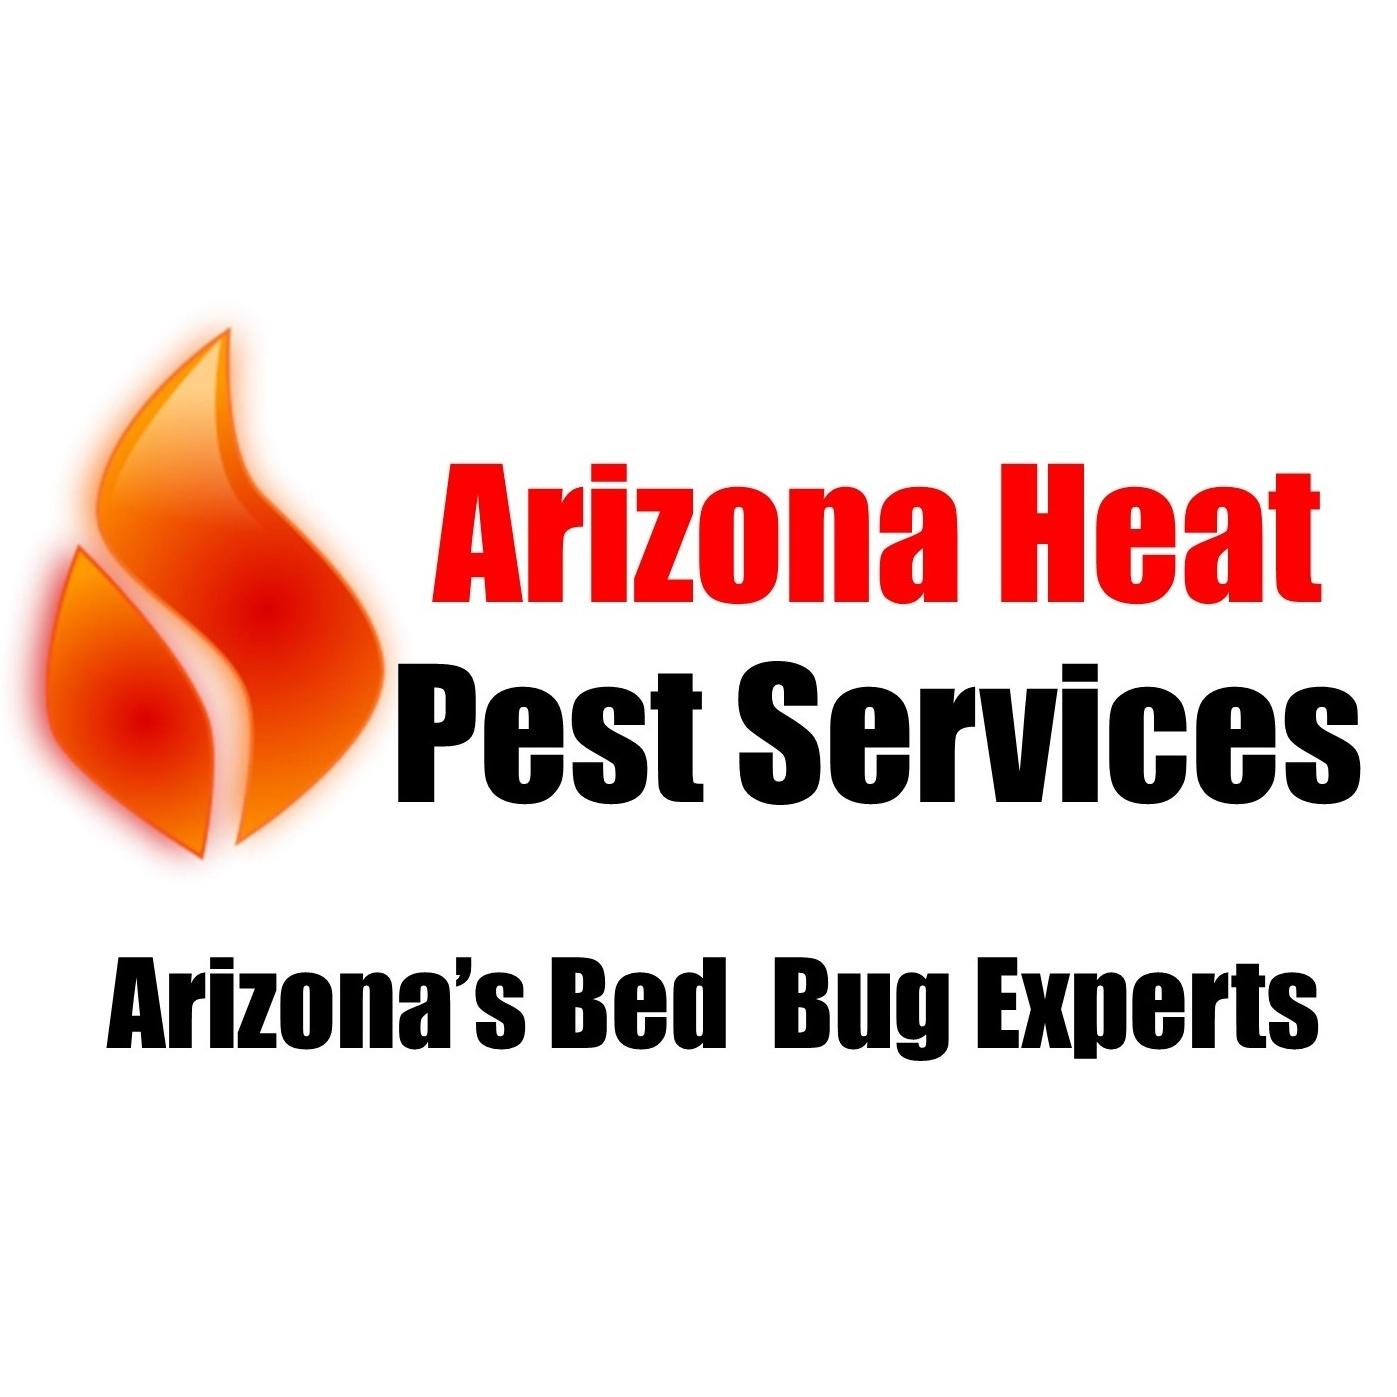 Pest Control Services Bed Bug Treatment